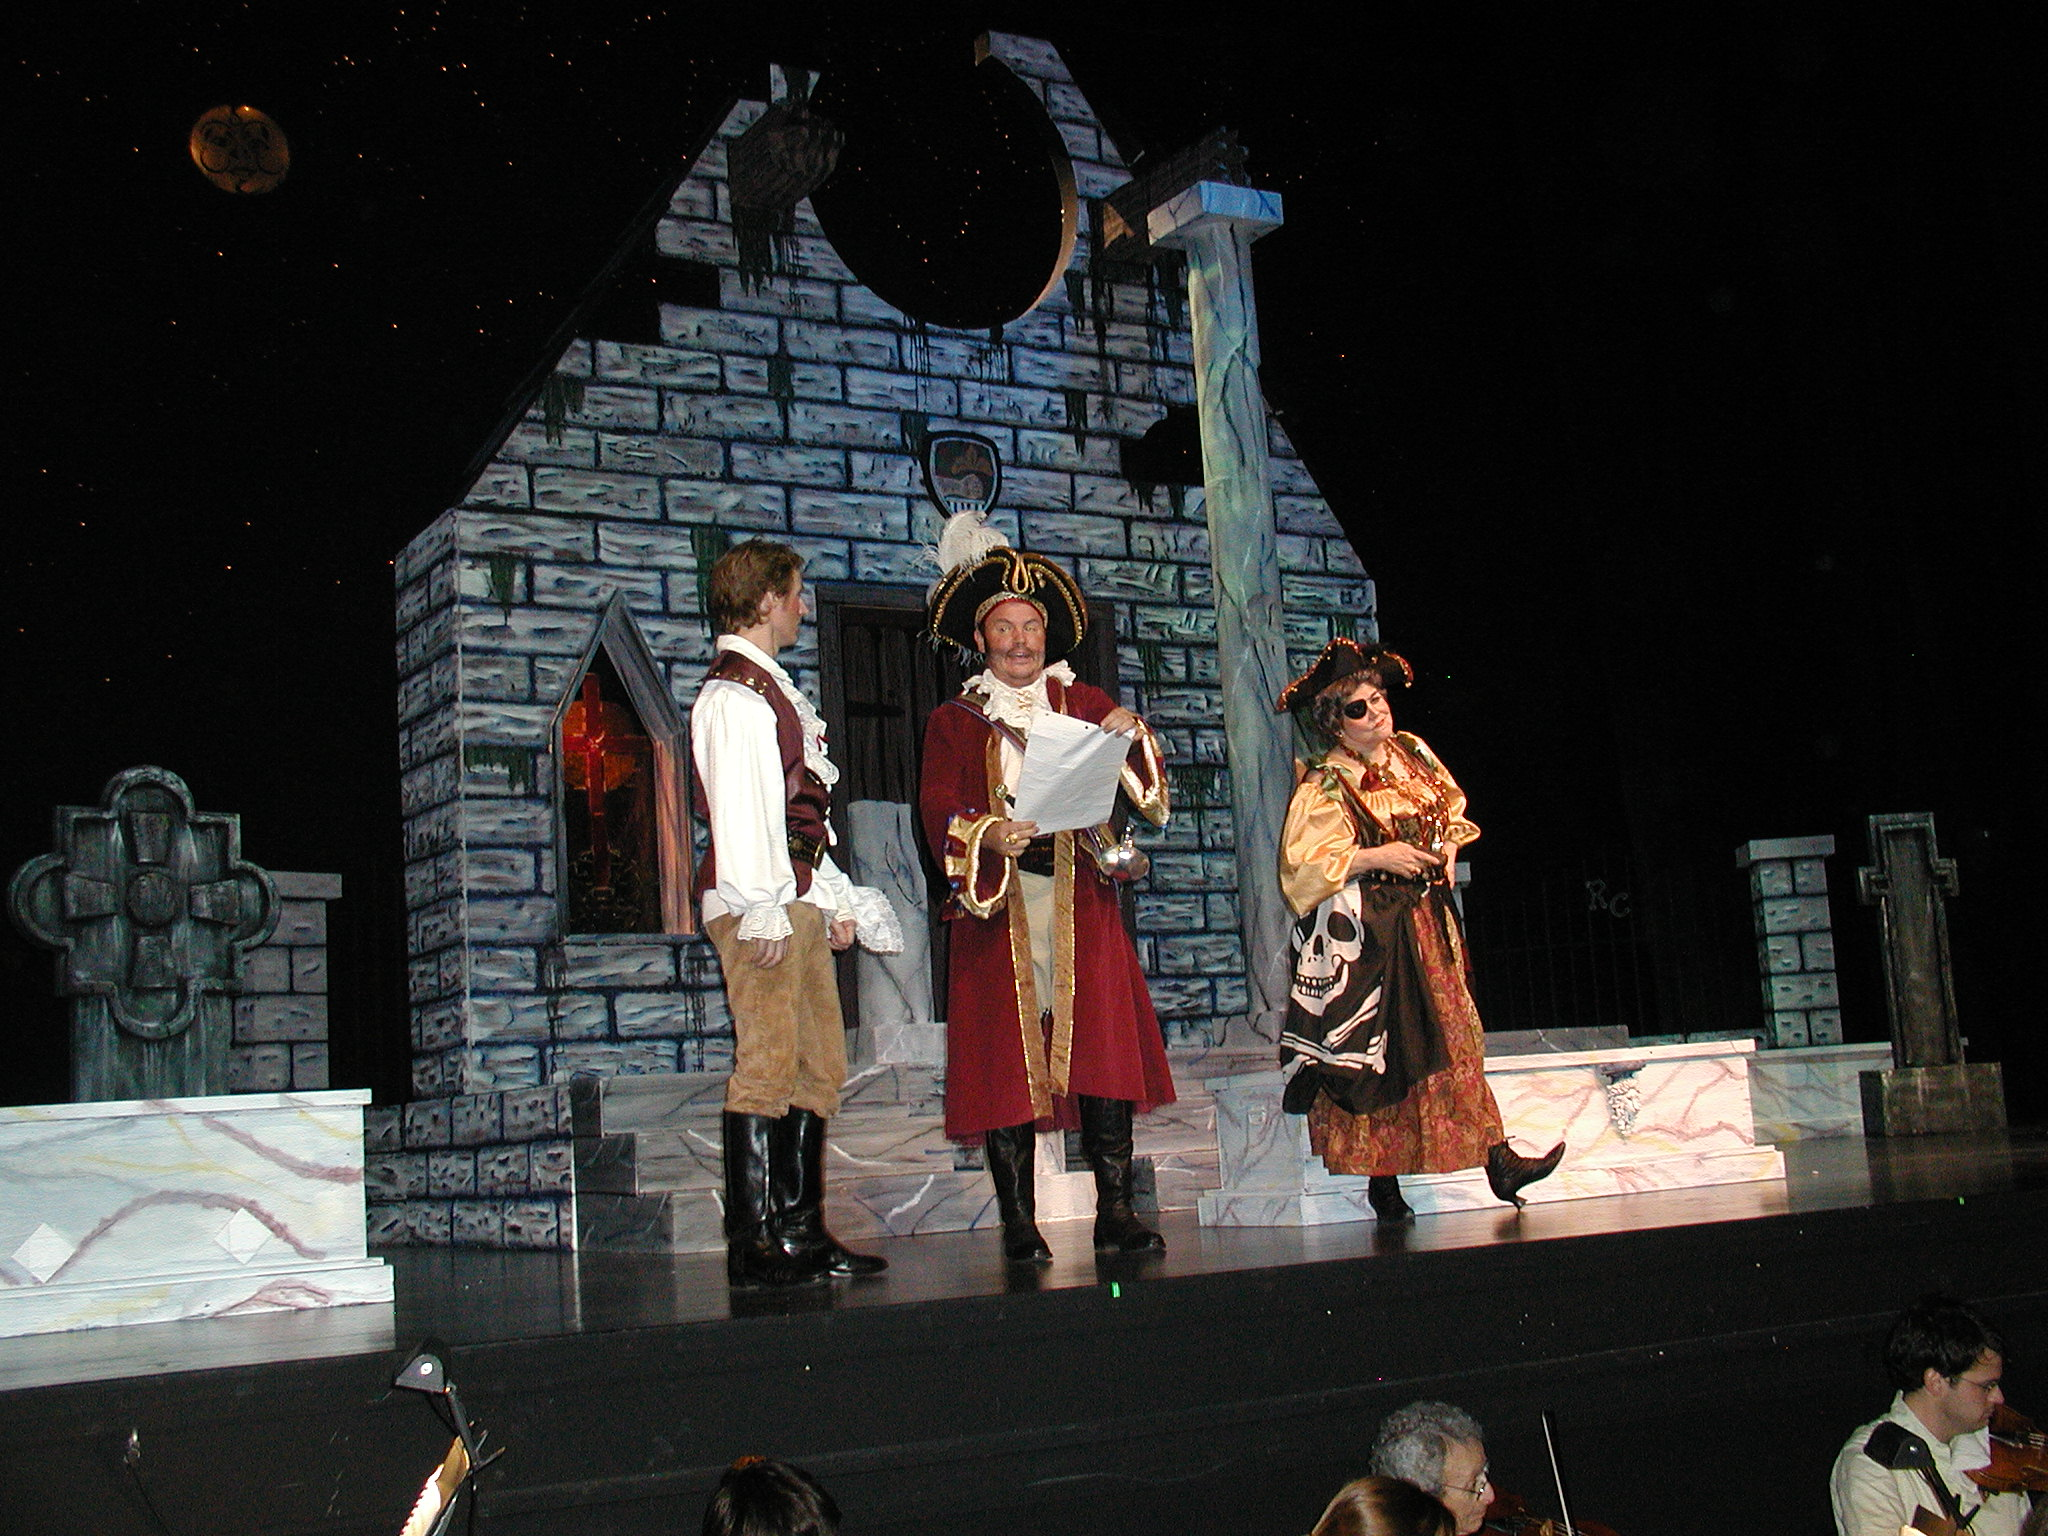 Pirates-rehearsal-10.12.05-125.jpg